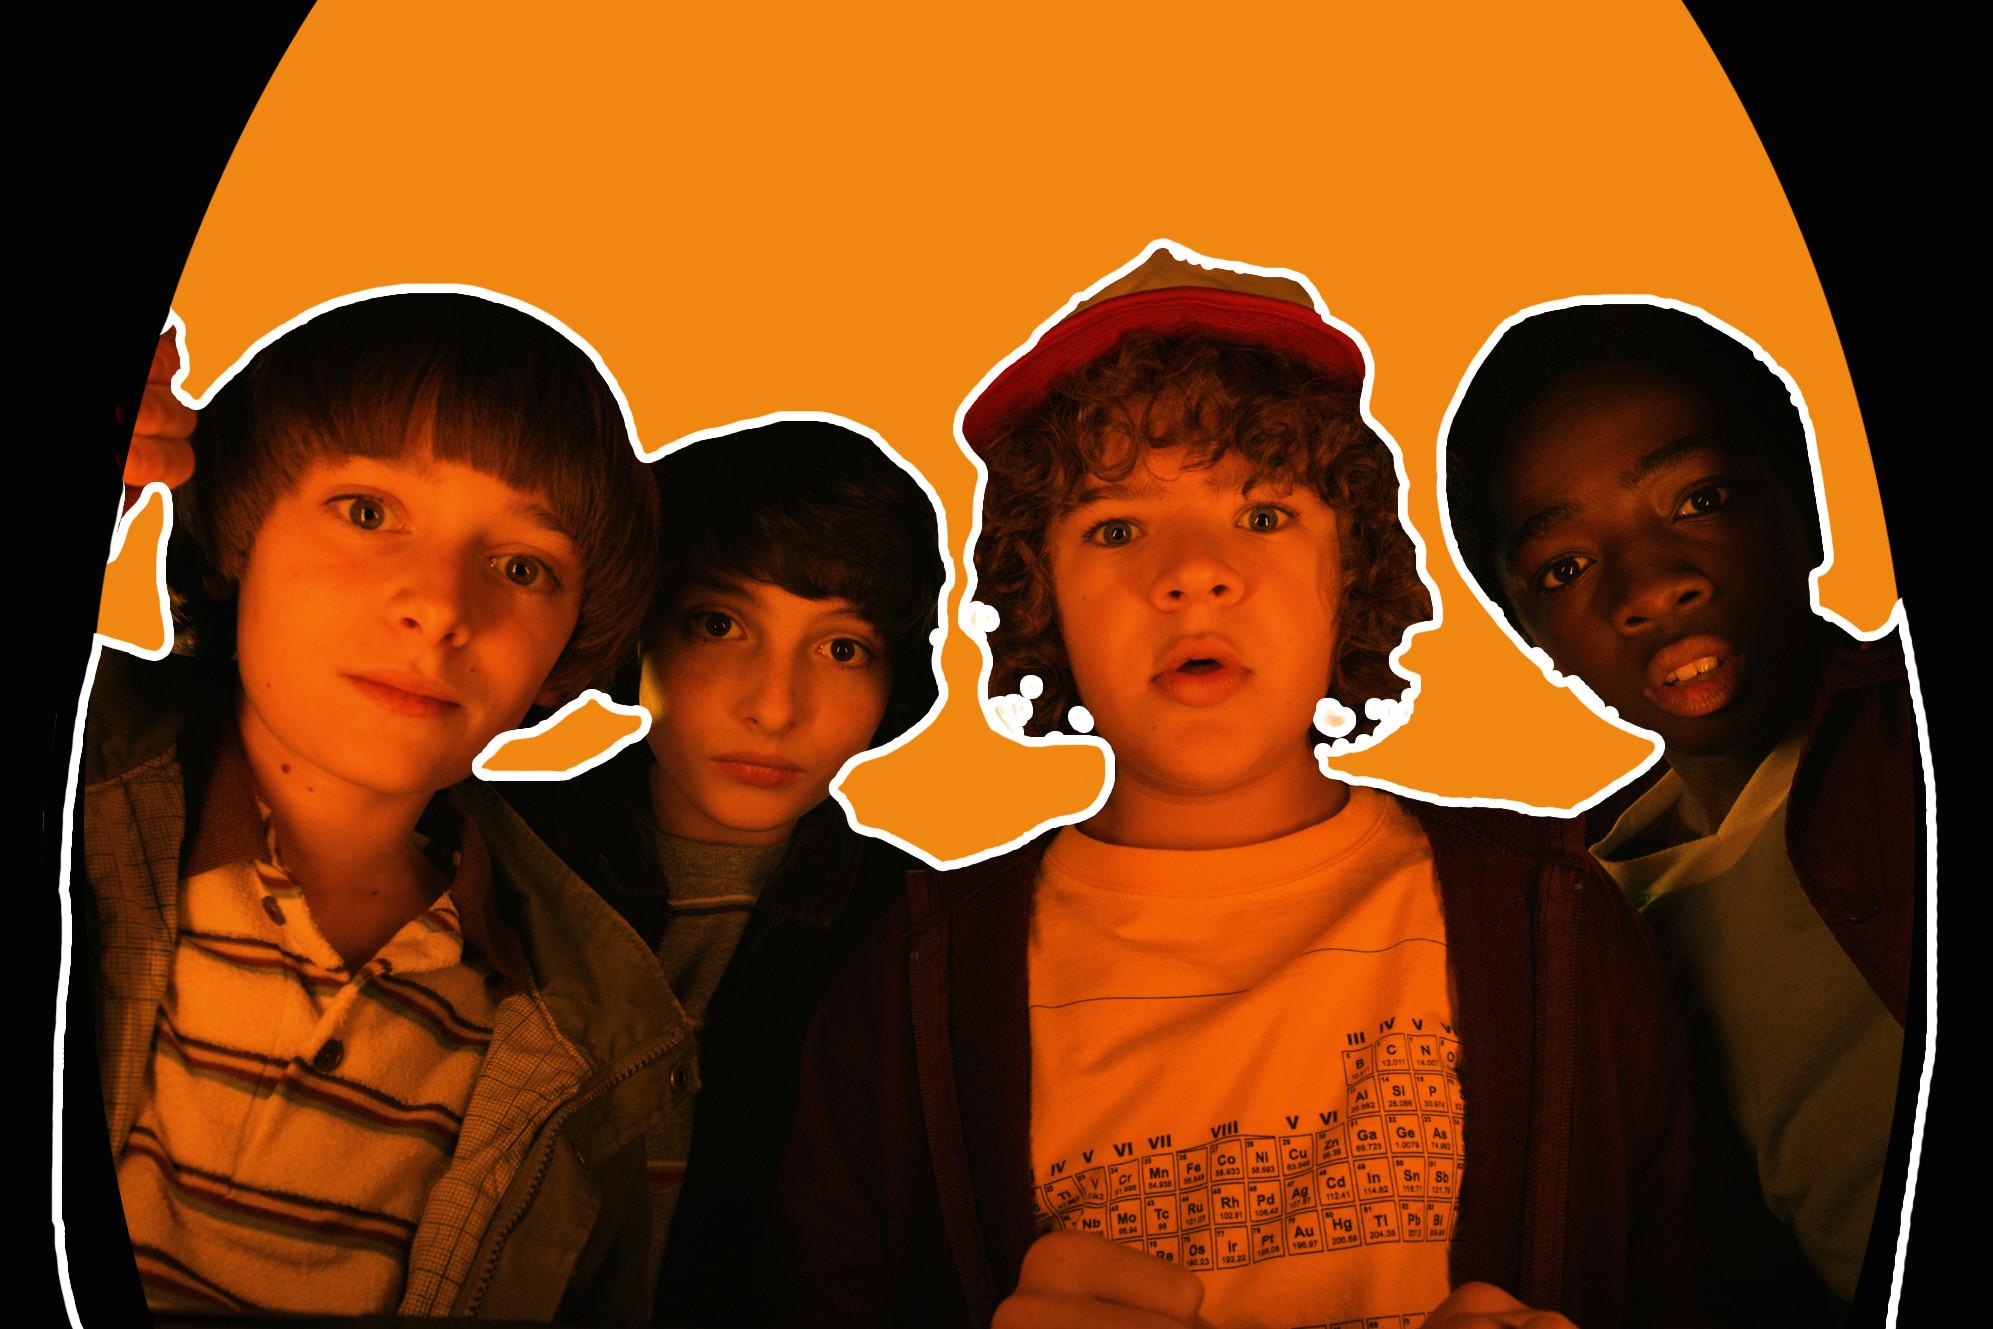 Stranger Things Drawing Map Stranger Things Season 2 theories Hopper Upside Down Will Time